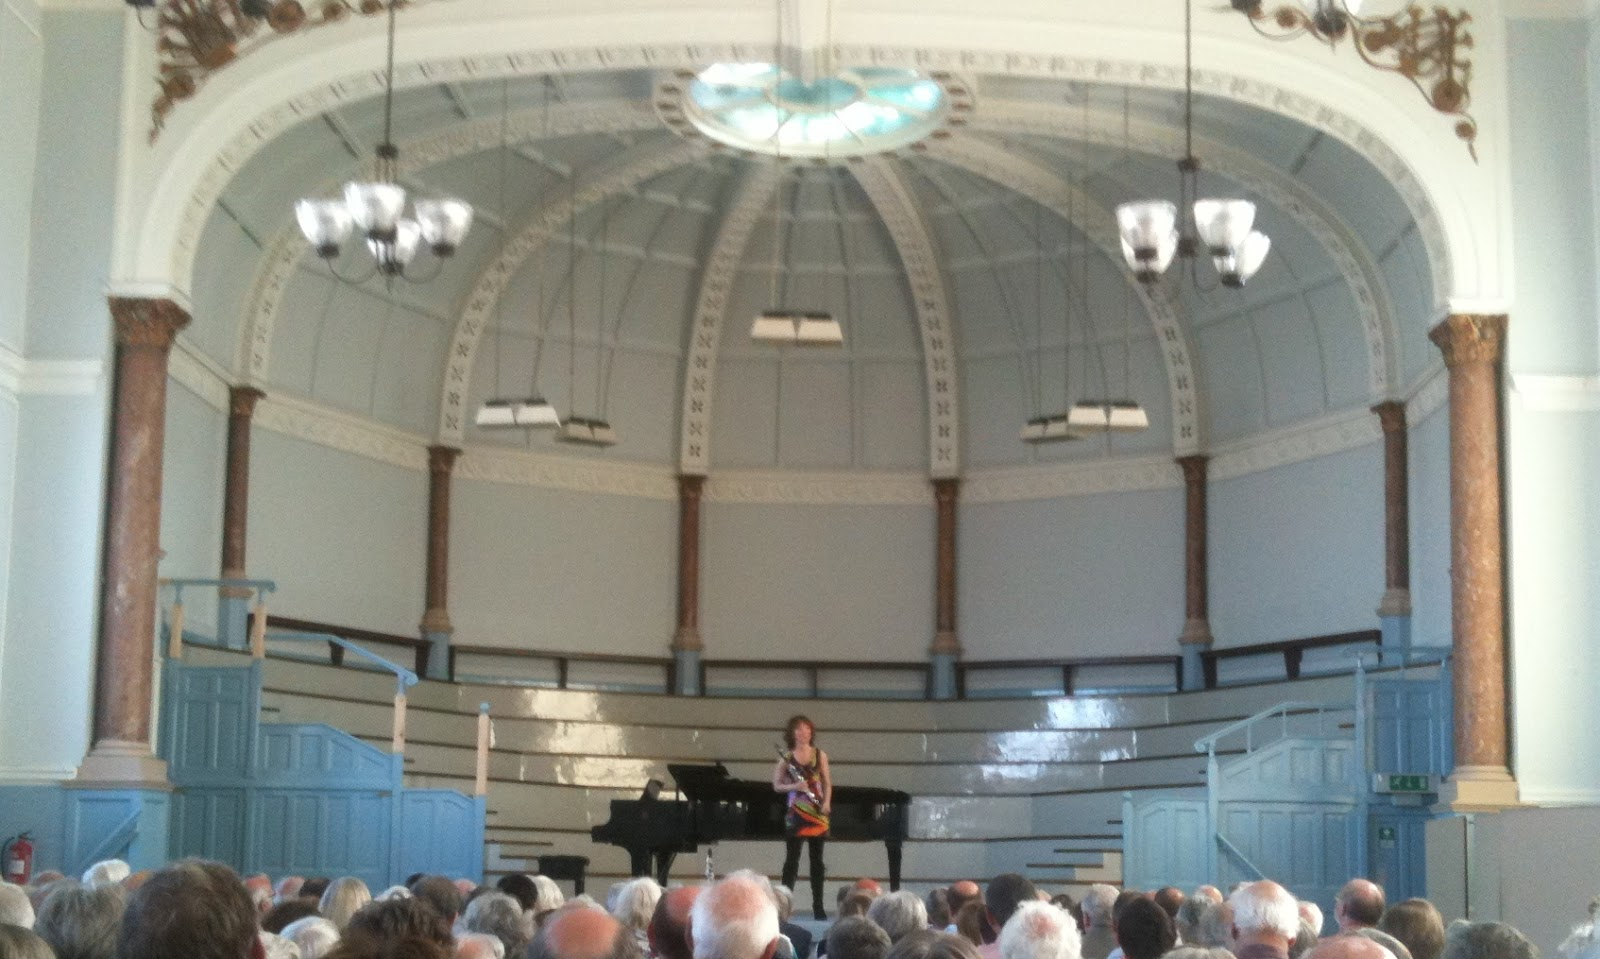 Emma Johnson en tunique psychadélique, au Shirehall de Hereford